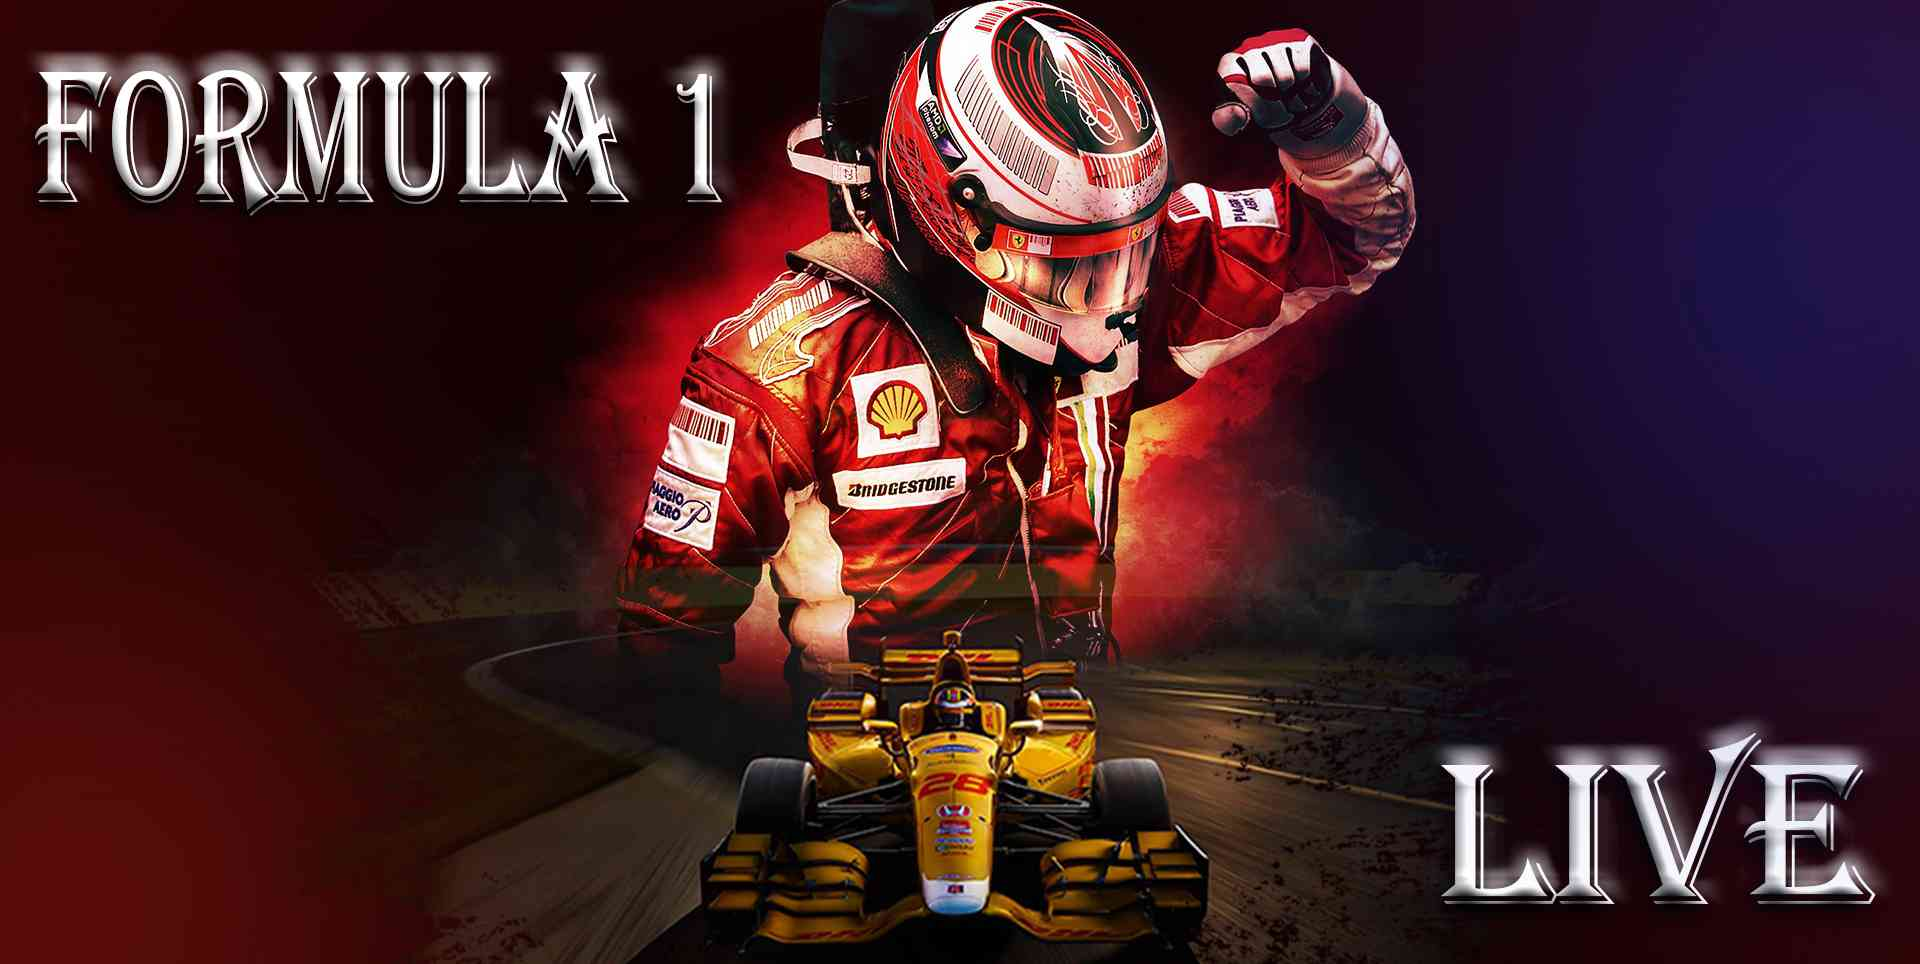 Live Ferrari Challenge Monza car Race Online Stream